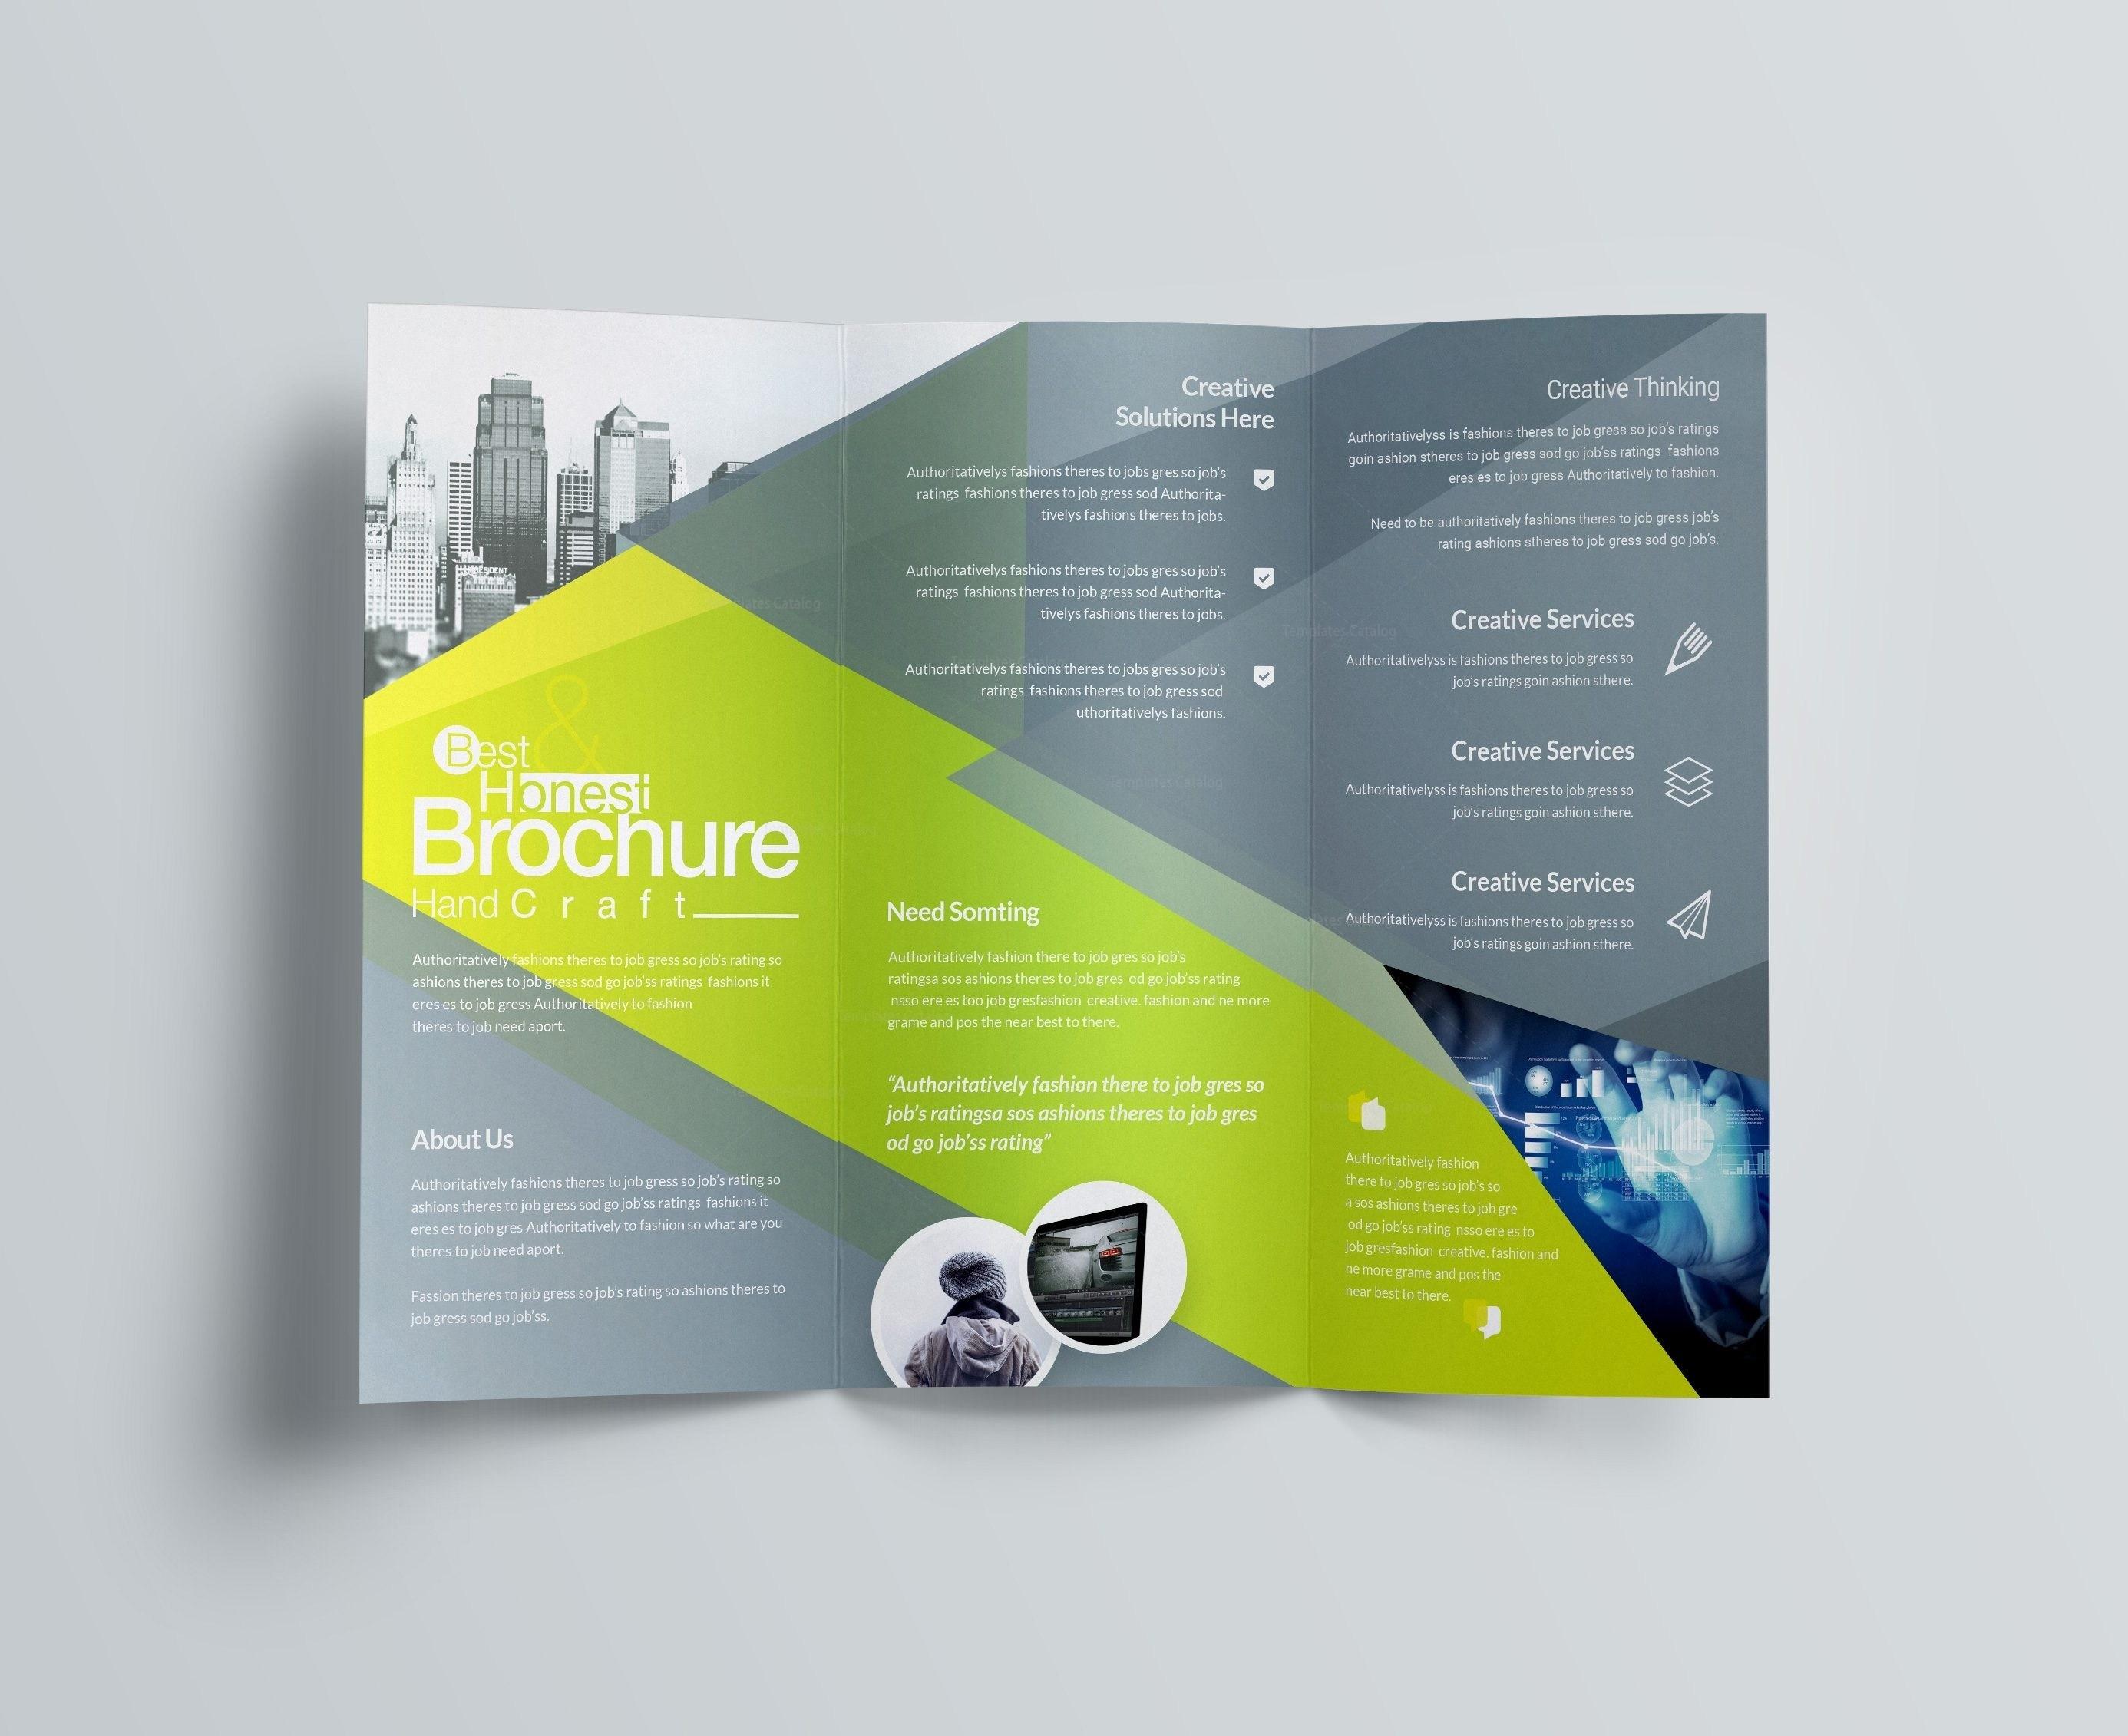 Tri Fold Letter Template - Tri Fold Brochure Template Free Unique 26 Inspirational Tri Fold